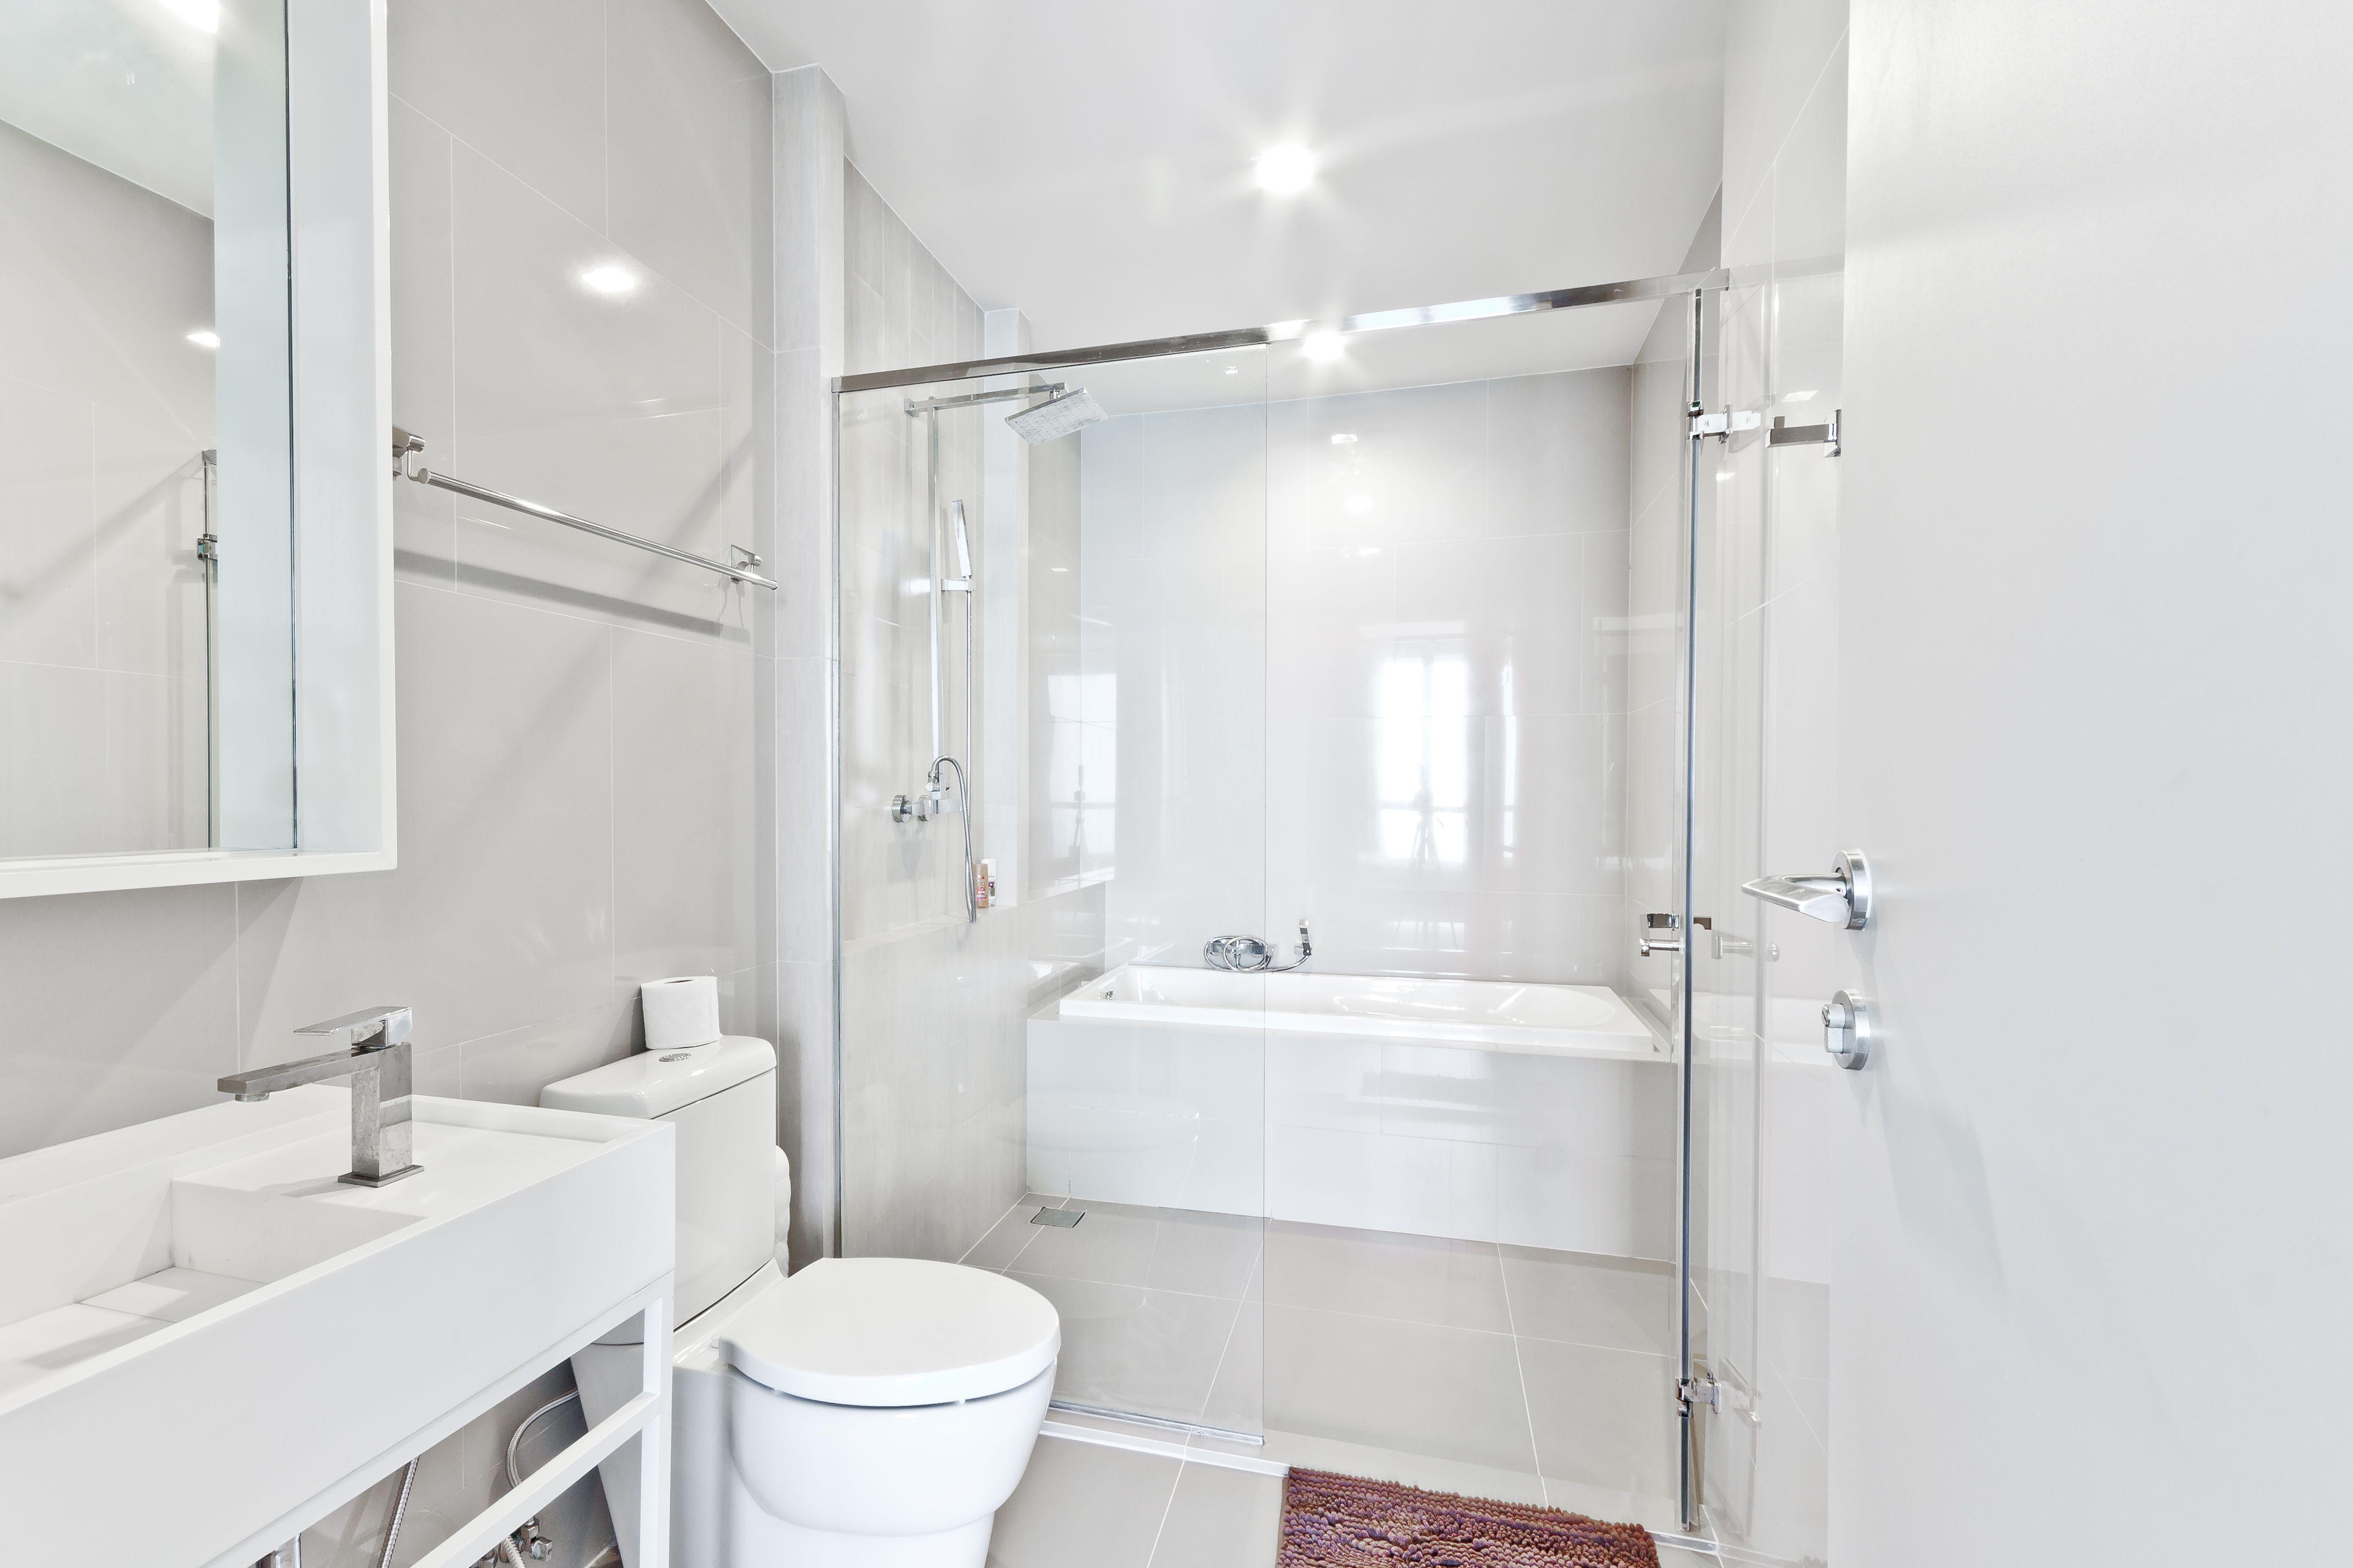 15 Beautiful Small Bathroom Designs on Amazing Small Bathrooms  id=17409